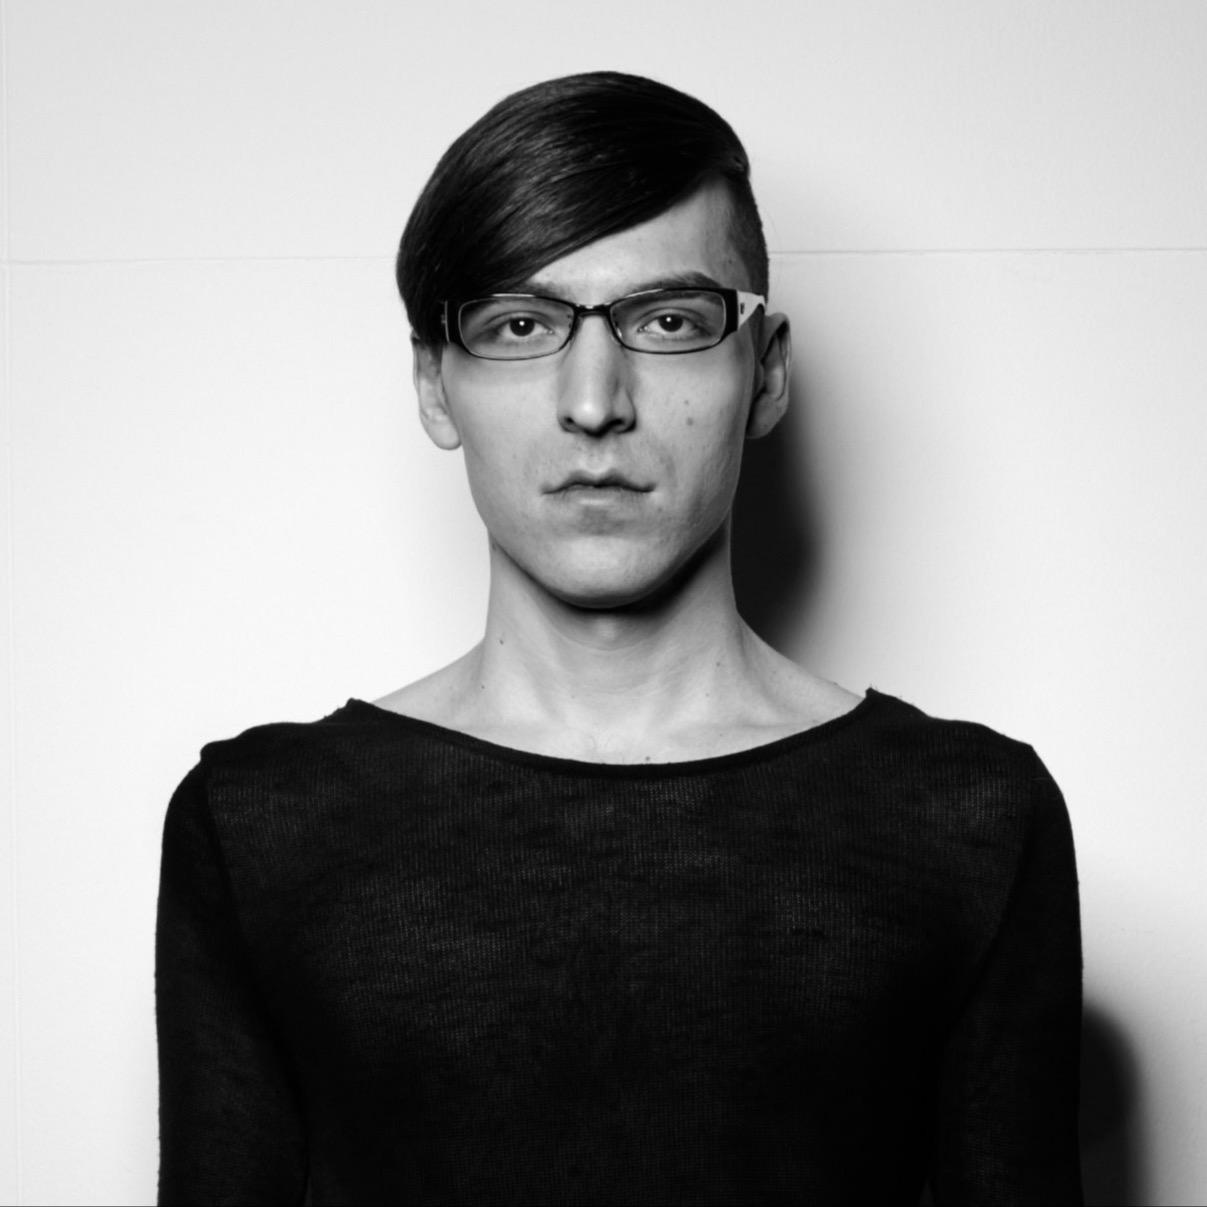 @stefanolotti Profile Image | Linktree